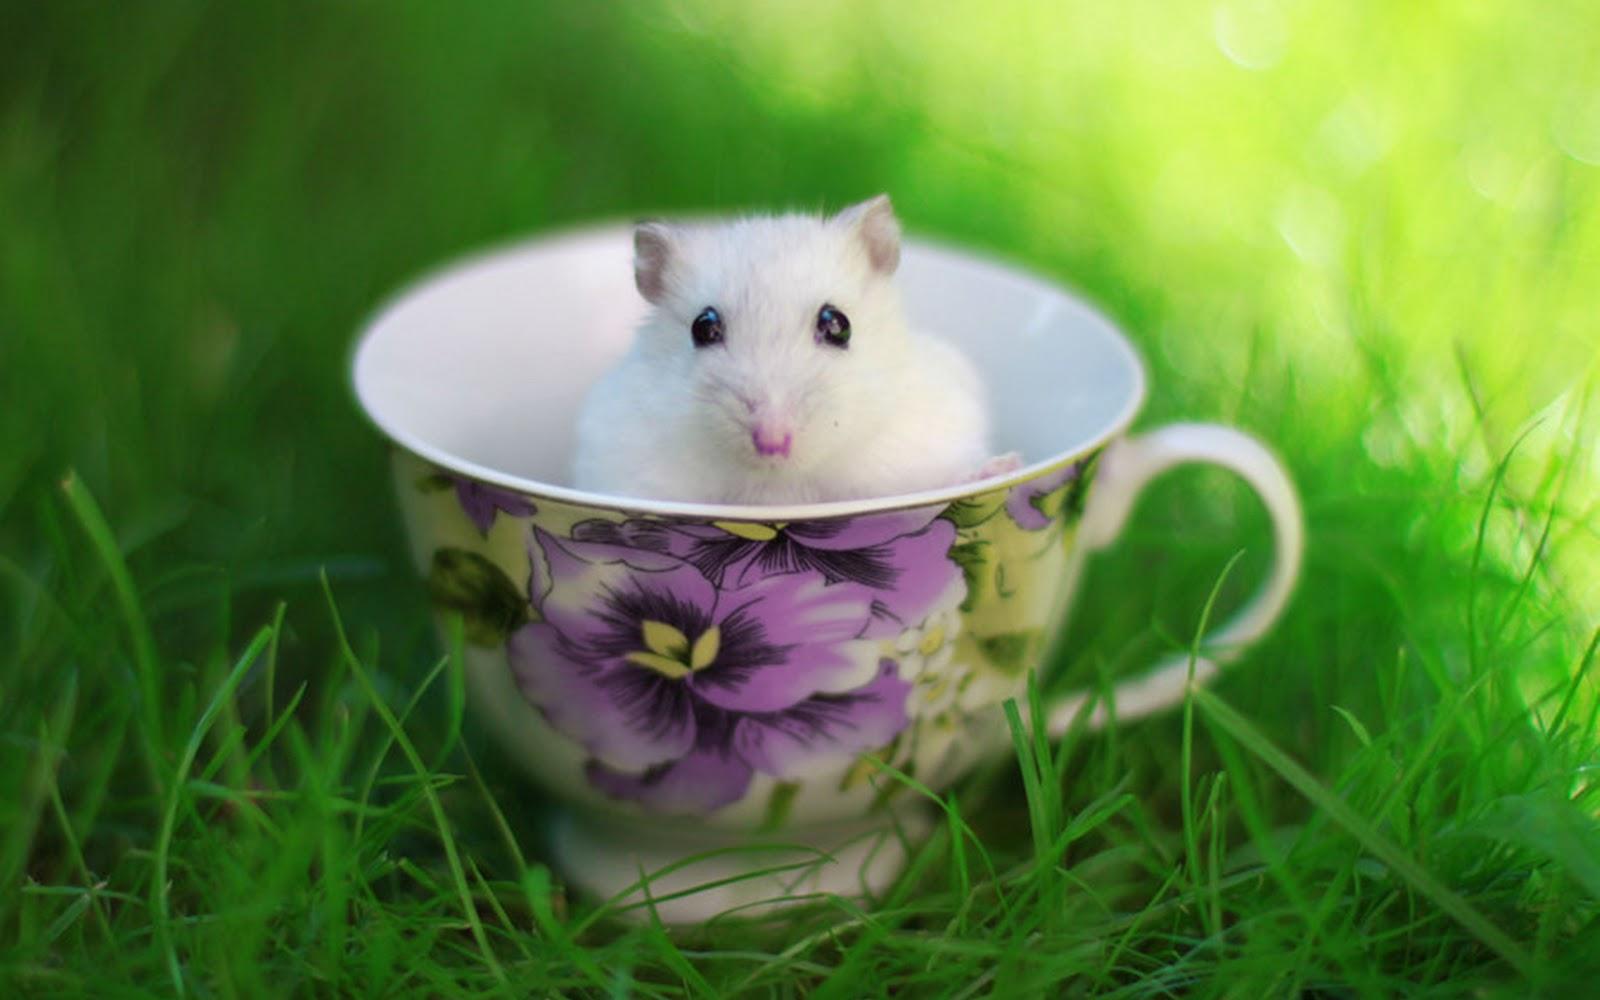 Cute Hamster in the Cup Wallpaper Wallpaper ME 1600x1000